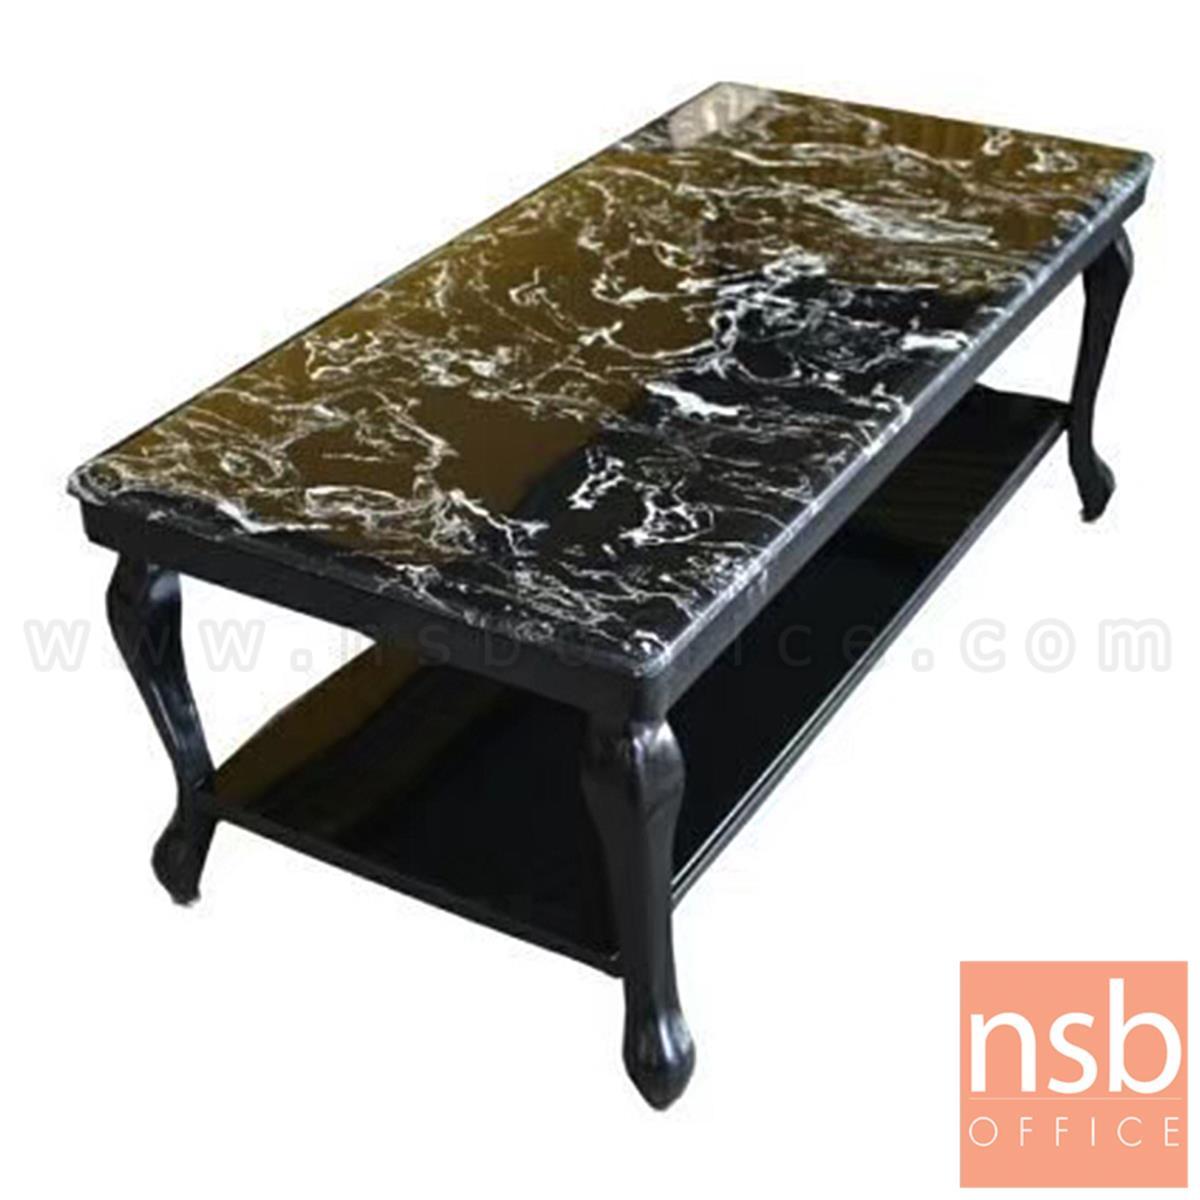 B13A294:โต๊ะกลางหน้าหินอ่อน รุ่น Majesty (มาเจสตี้) ขนาด 110W cm. ขาเหล็ก